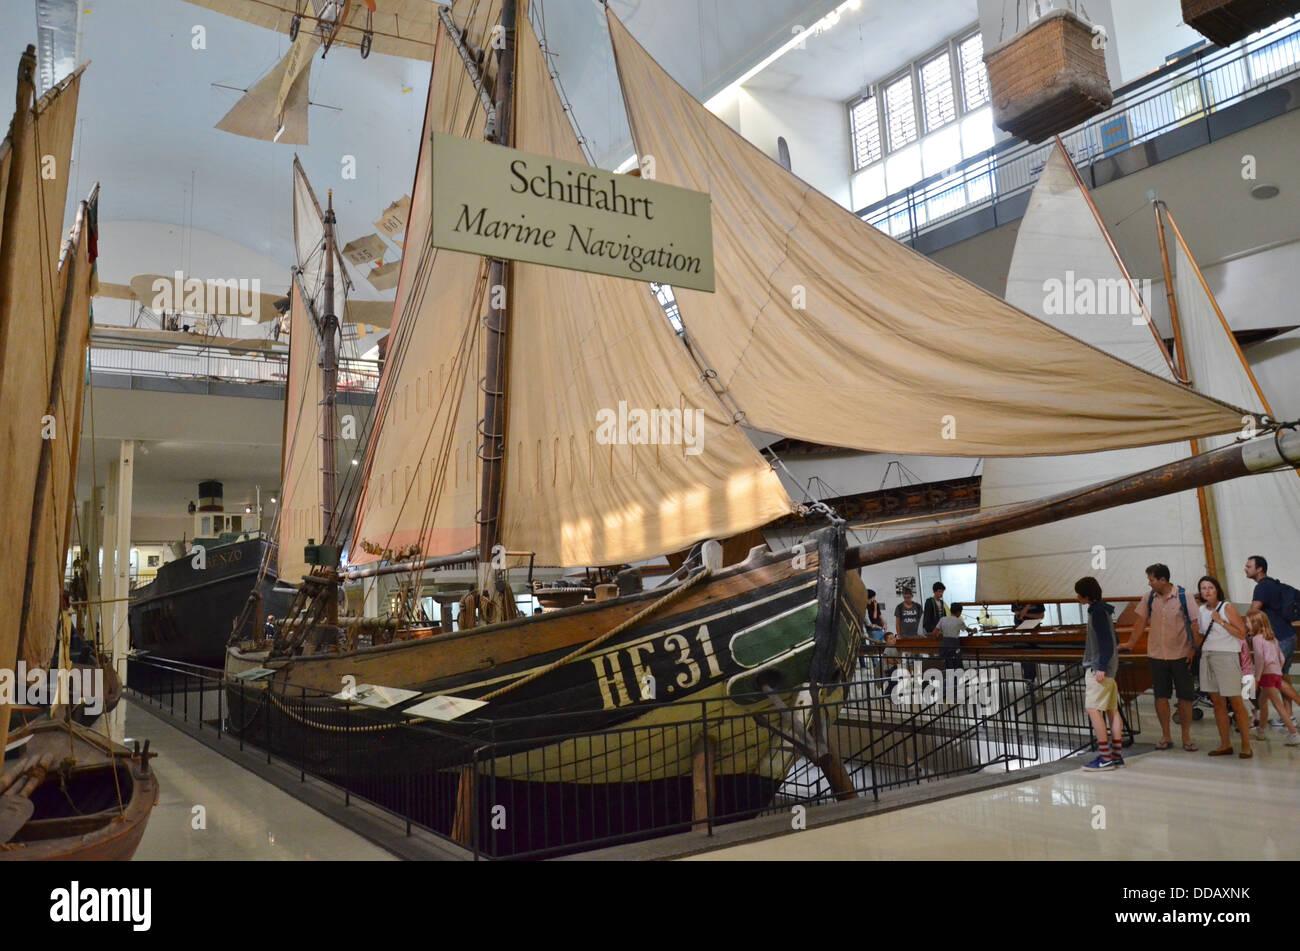 Deutsches Museum, Munich Bavaria Germany, the Ewer/Lighter 'Maria' deep sea fishing boat, marine navigation - Stock Image